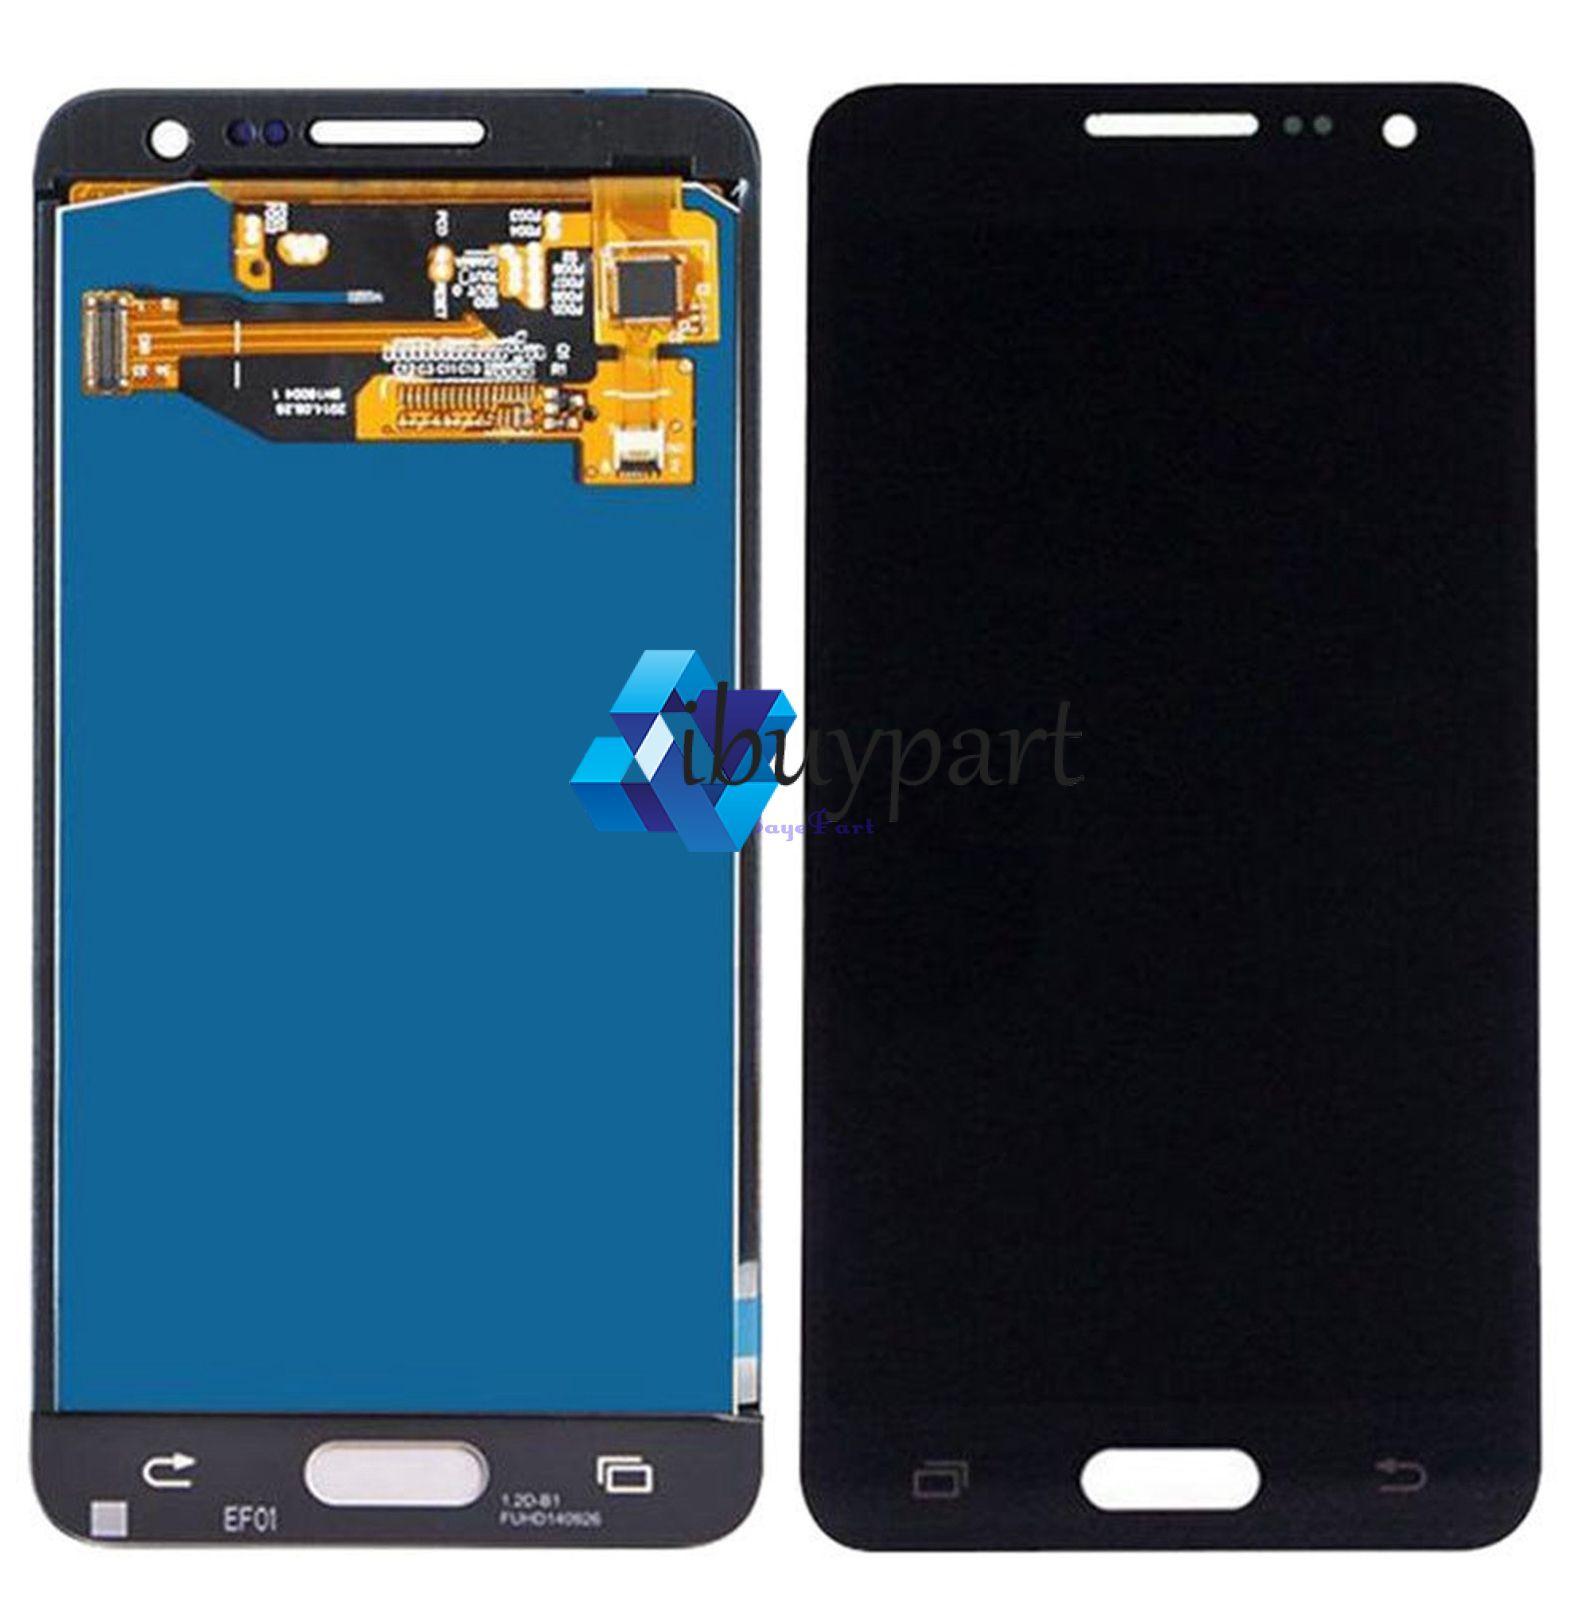 Noir Ecran LCD Tactile Pour Samsung Galaxy A5 A500 2015 A500F A500M SM-A500FU 11